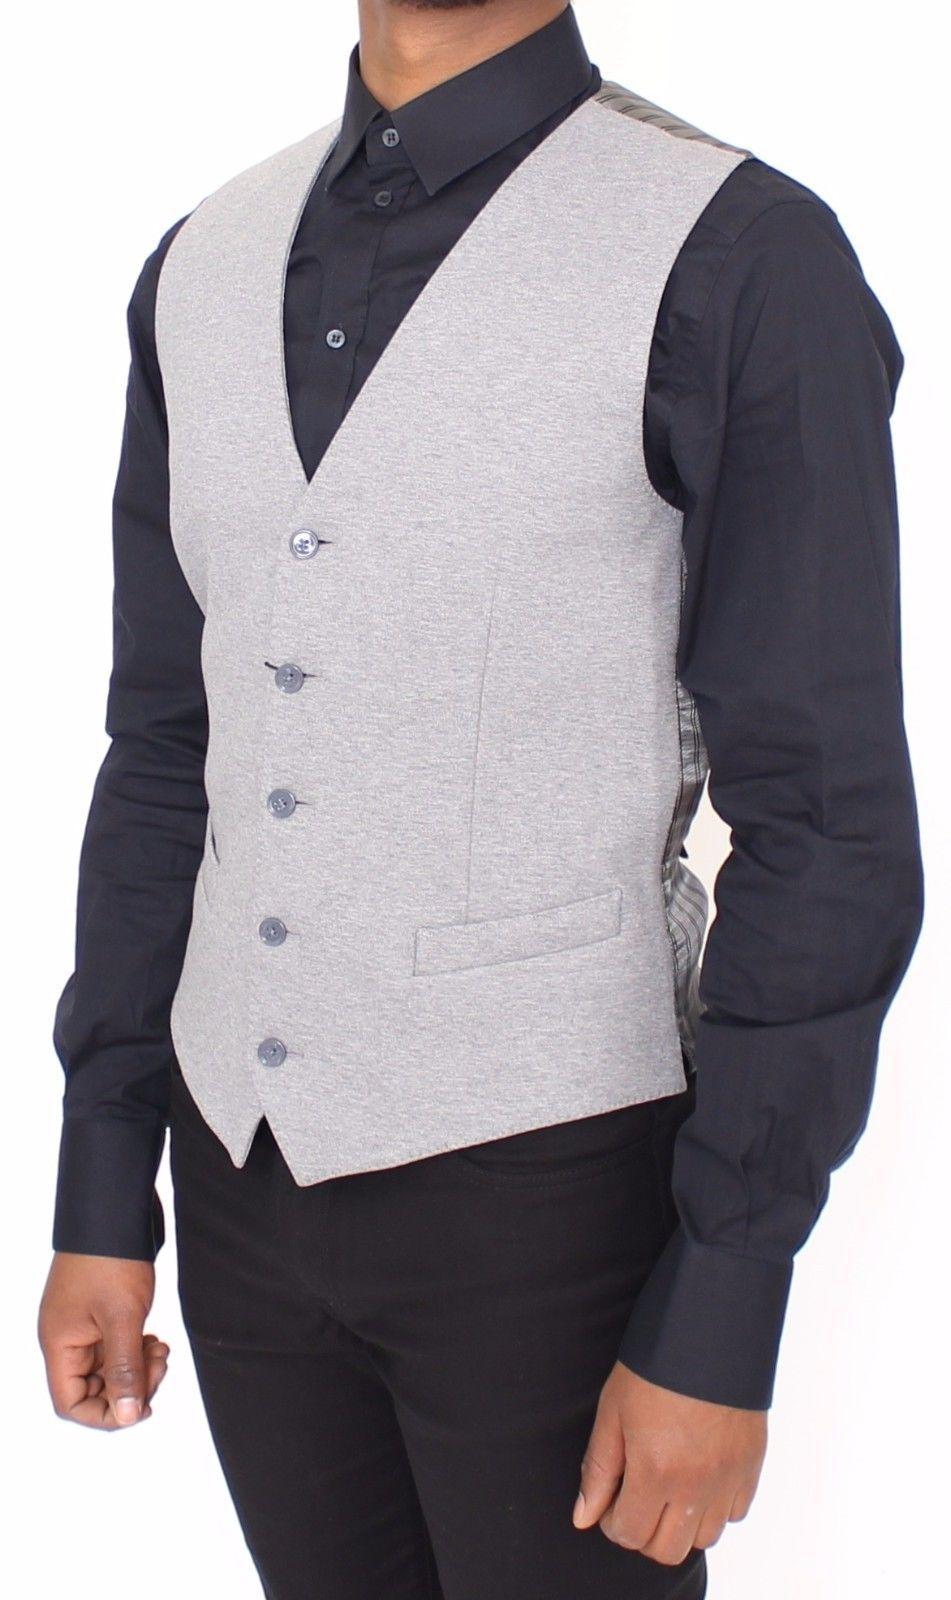 Dolce & Gabbana Gray Cotton Stretch Dress Vest Blazer